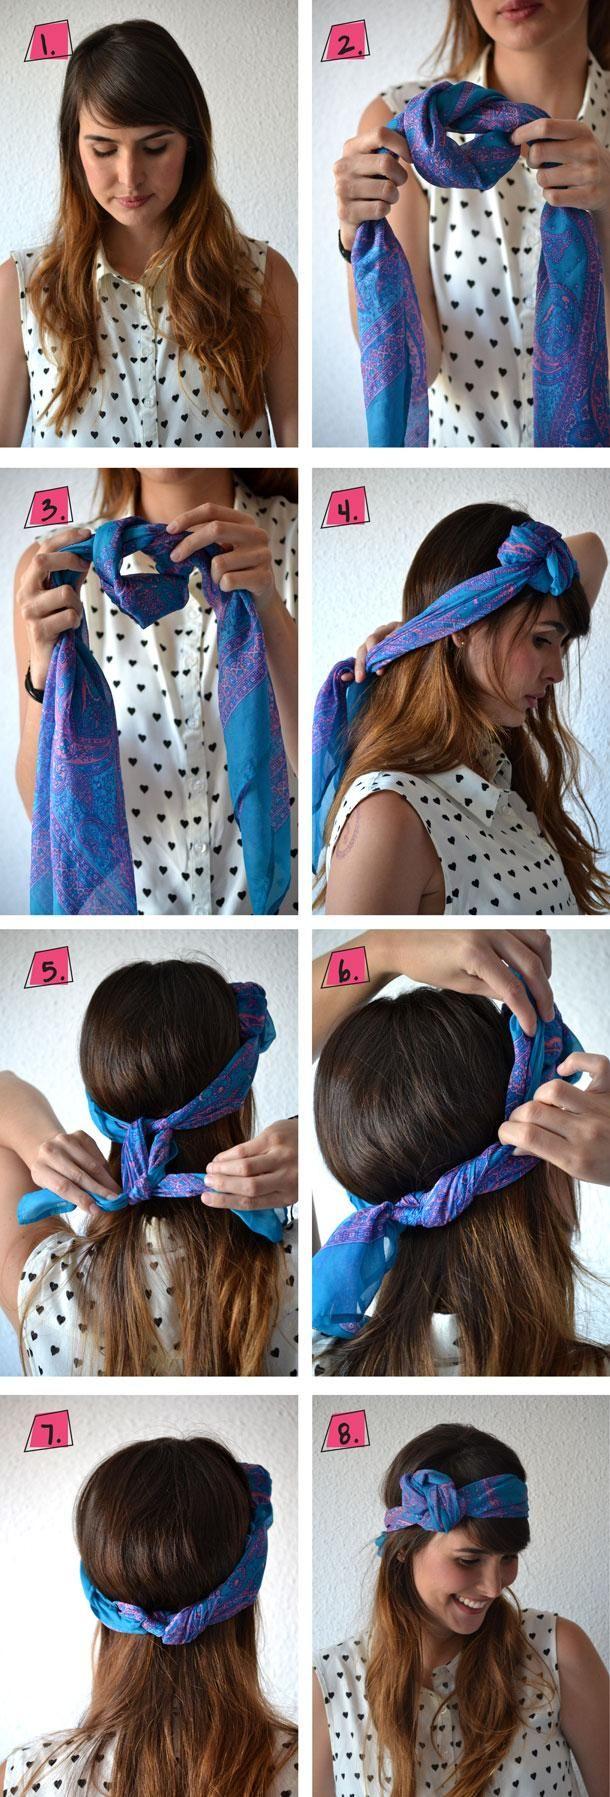 Tie Bandana 26 Grosse Bandana Firsuren Mit Anweisungen Anweisungen Bandana Firsuren Haar Styling Schal Frisuren Frisur Knoten